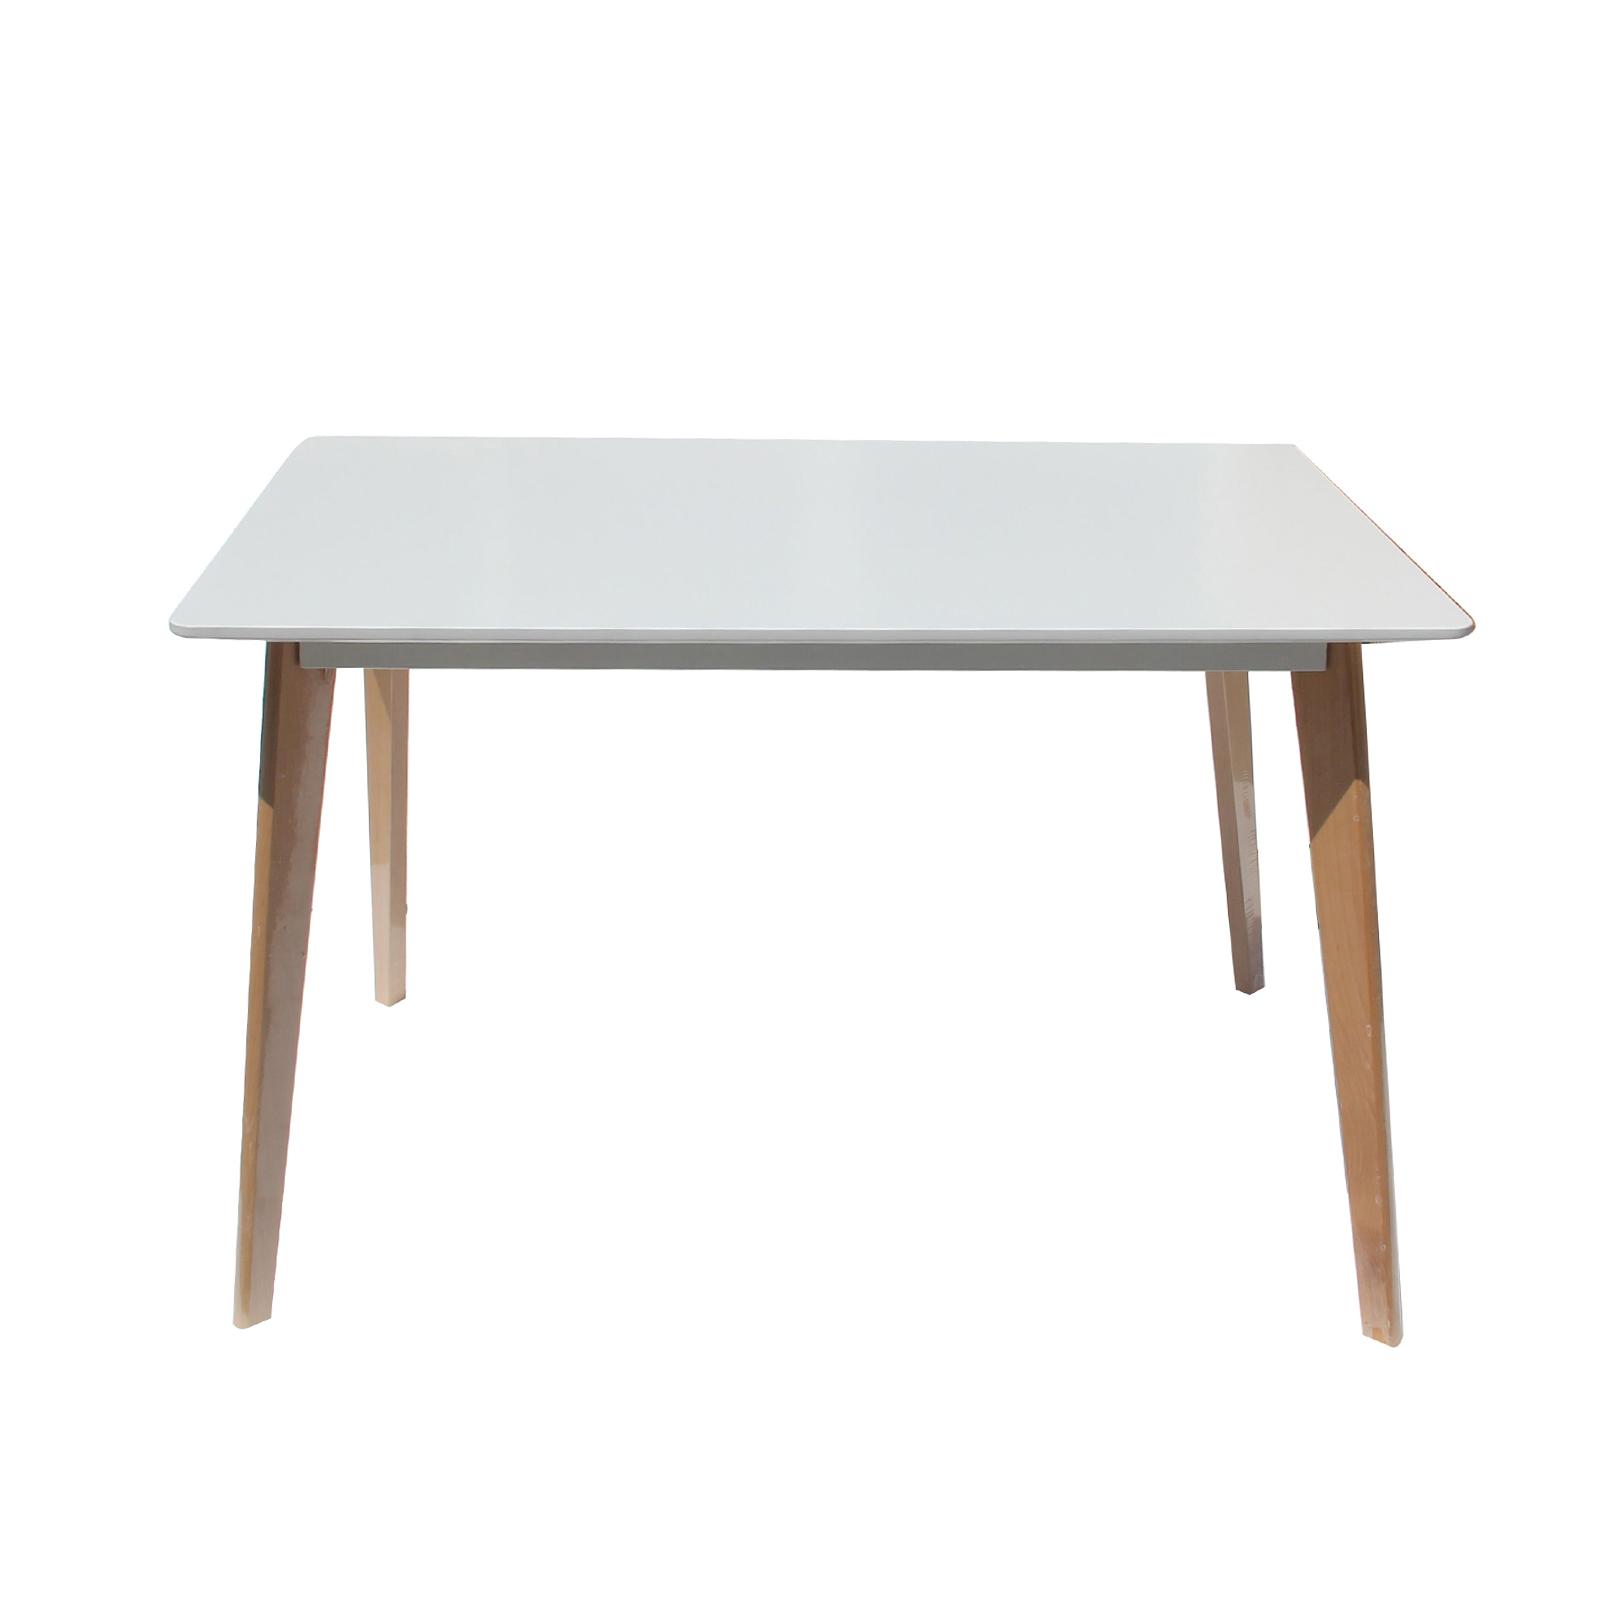 Replica eames dsw city dining table white designer kitchen matte medium ebay - Replica eames dining table ...